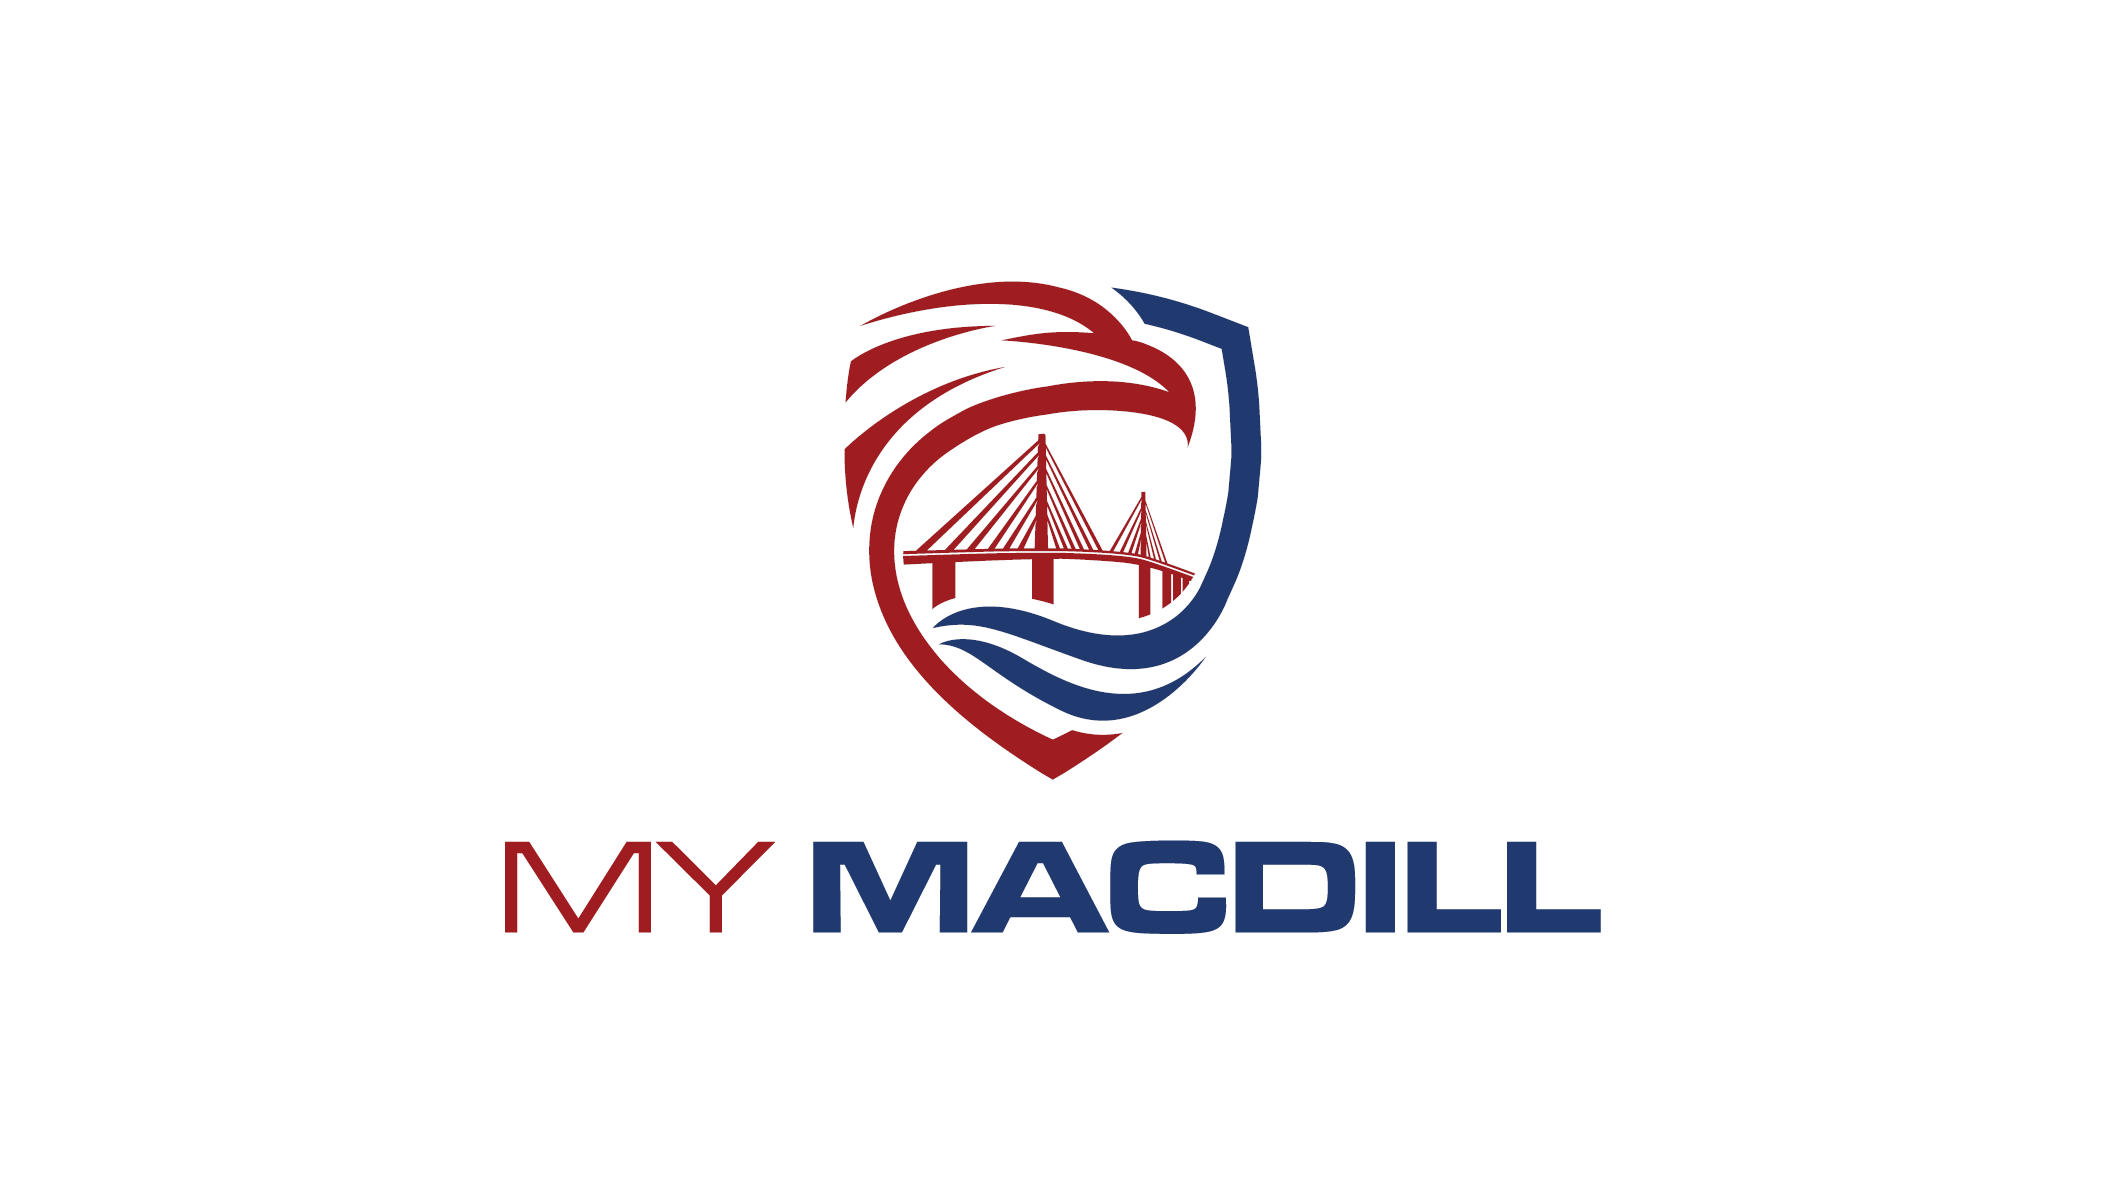 My Macdill